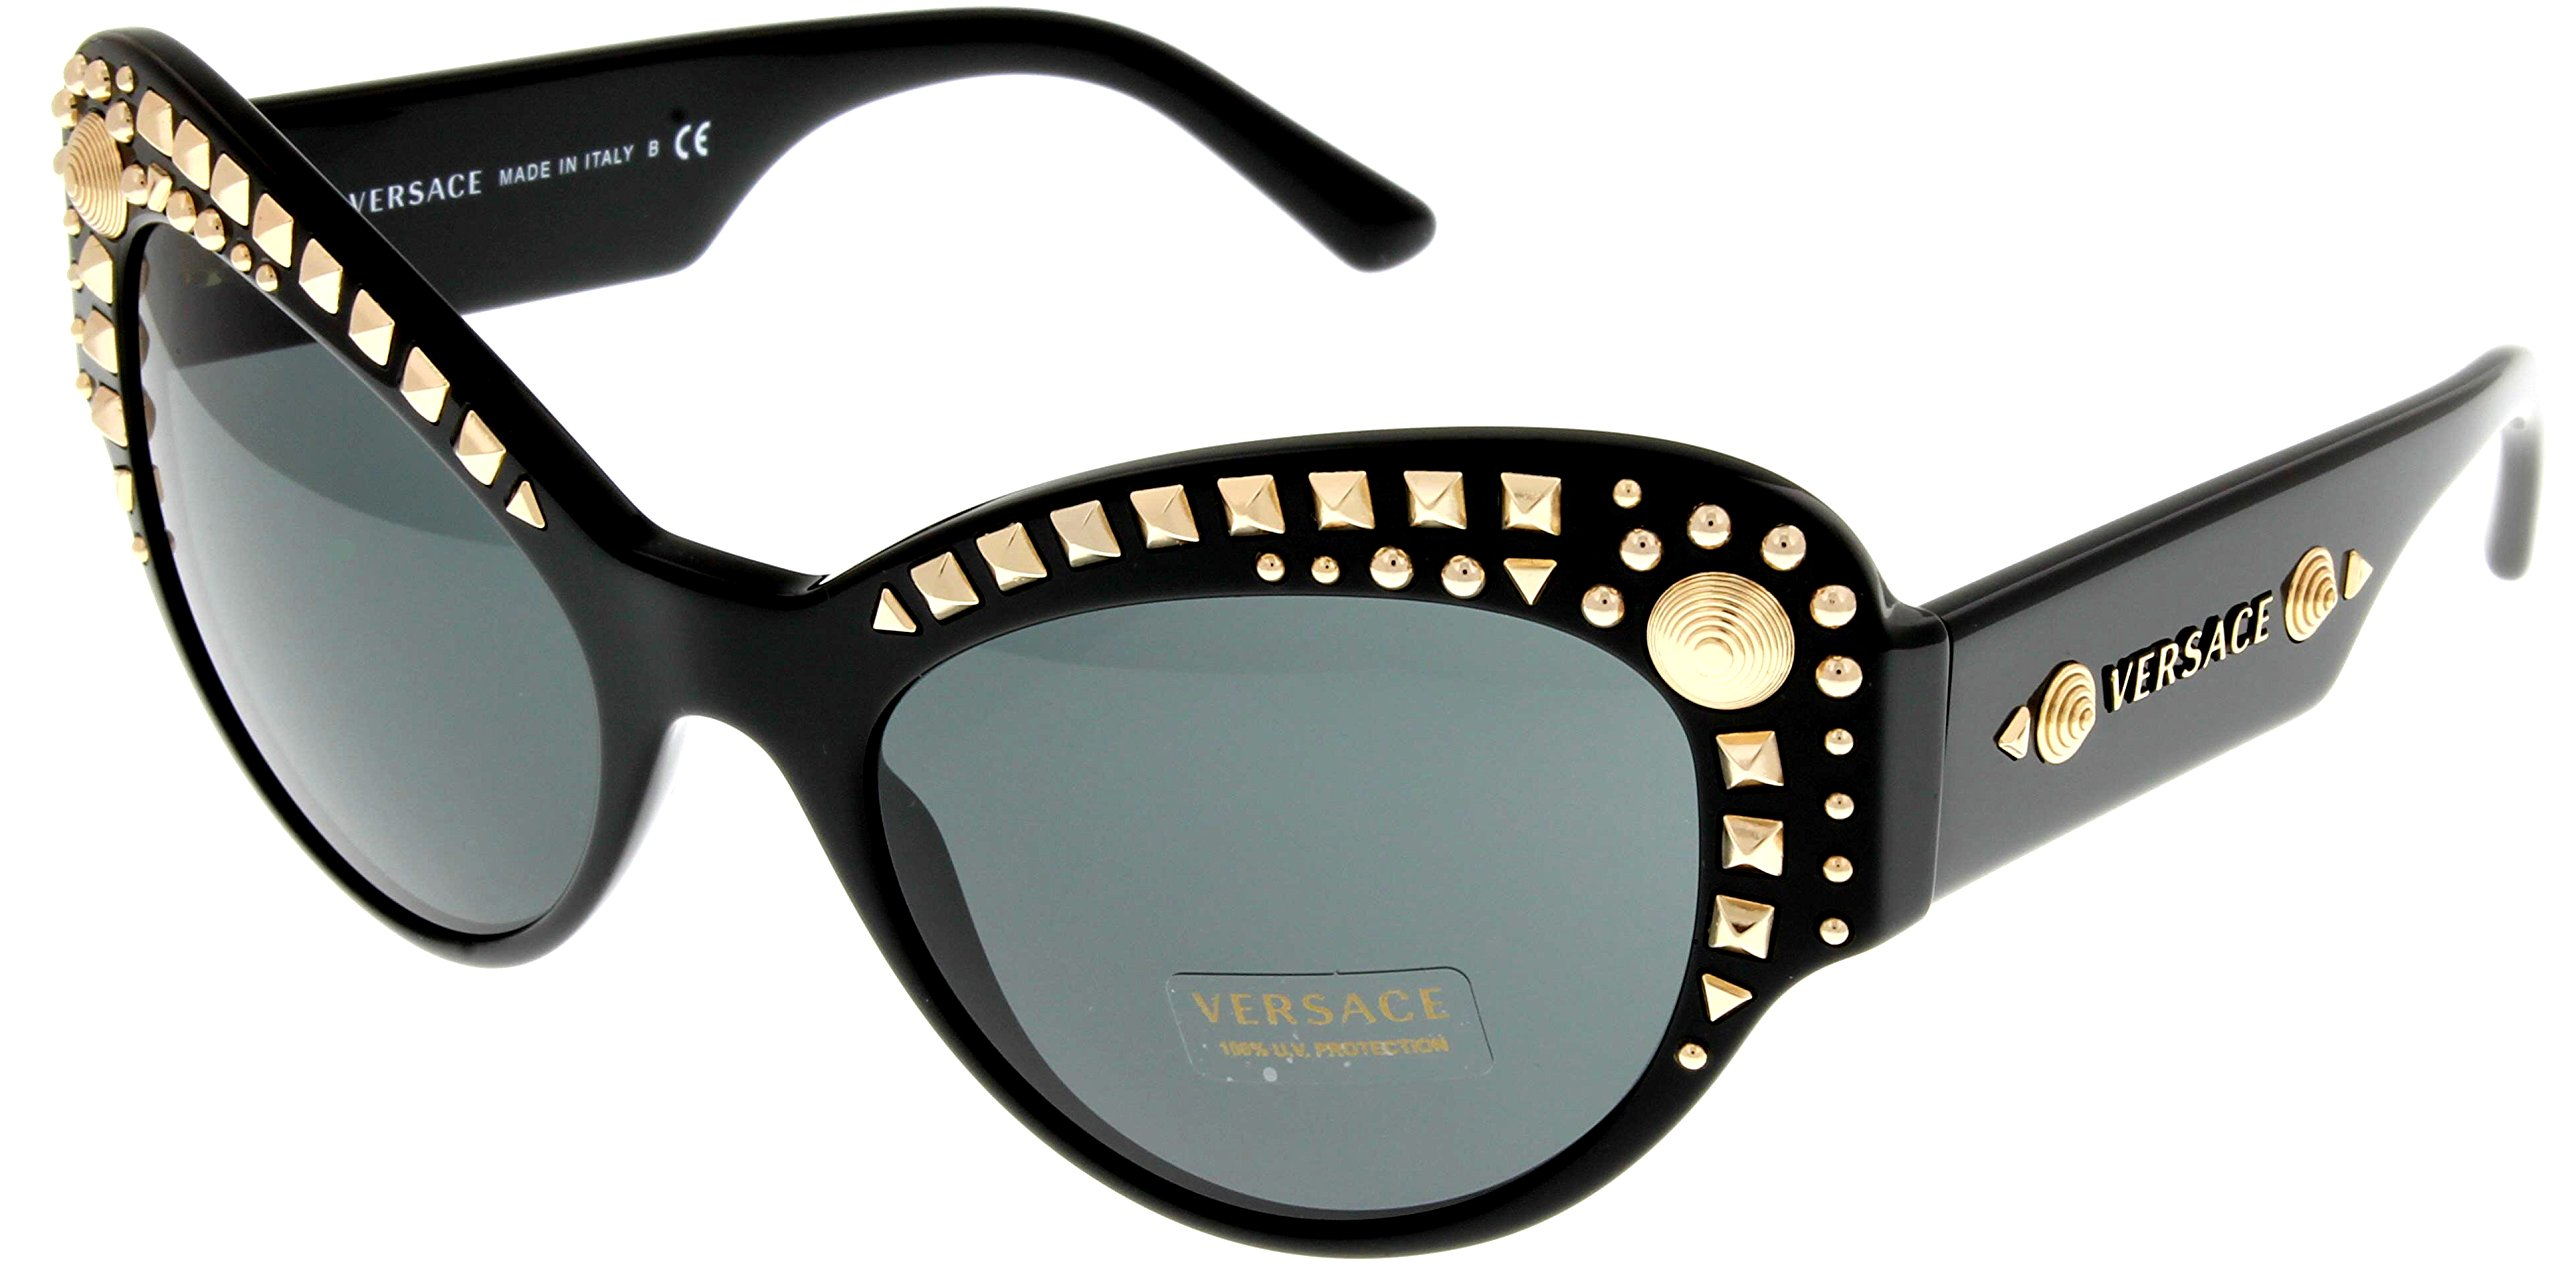 Versace Sunglasses Womens Black Cateye 100% UV Protection VE4269 GB1/87 by Versace